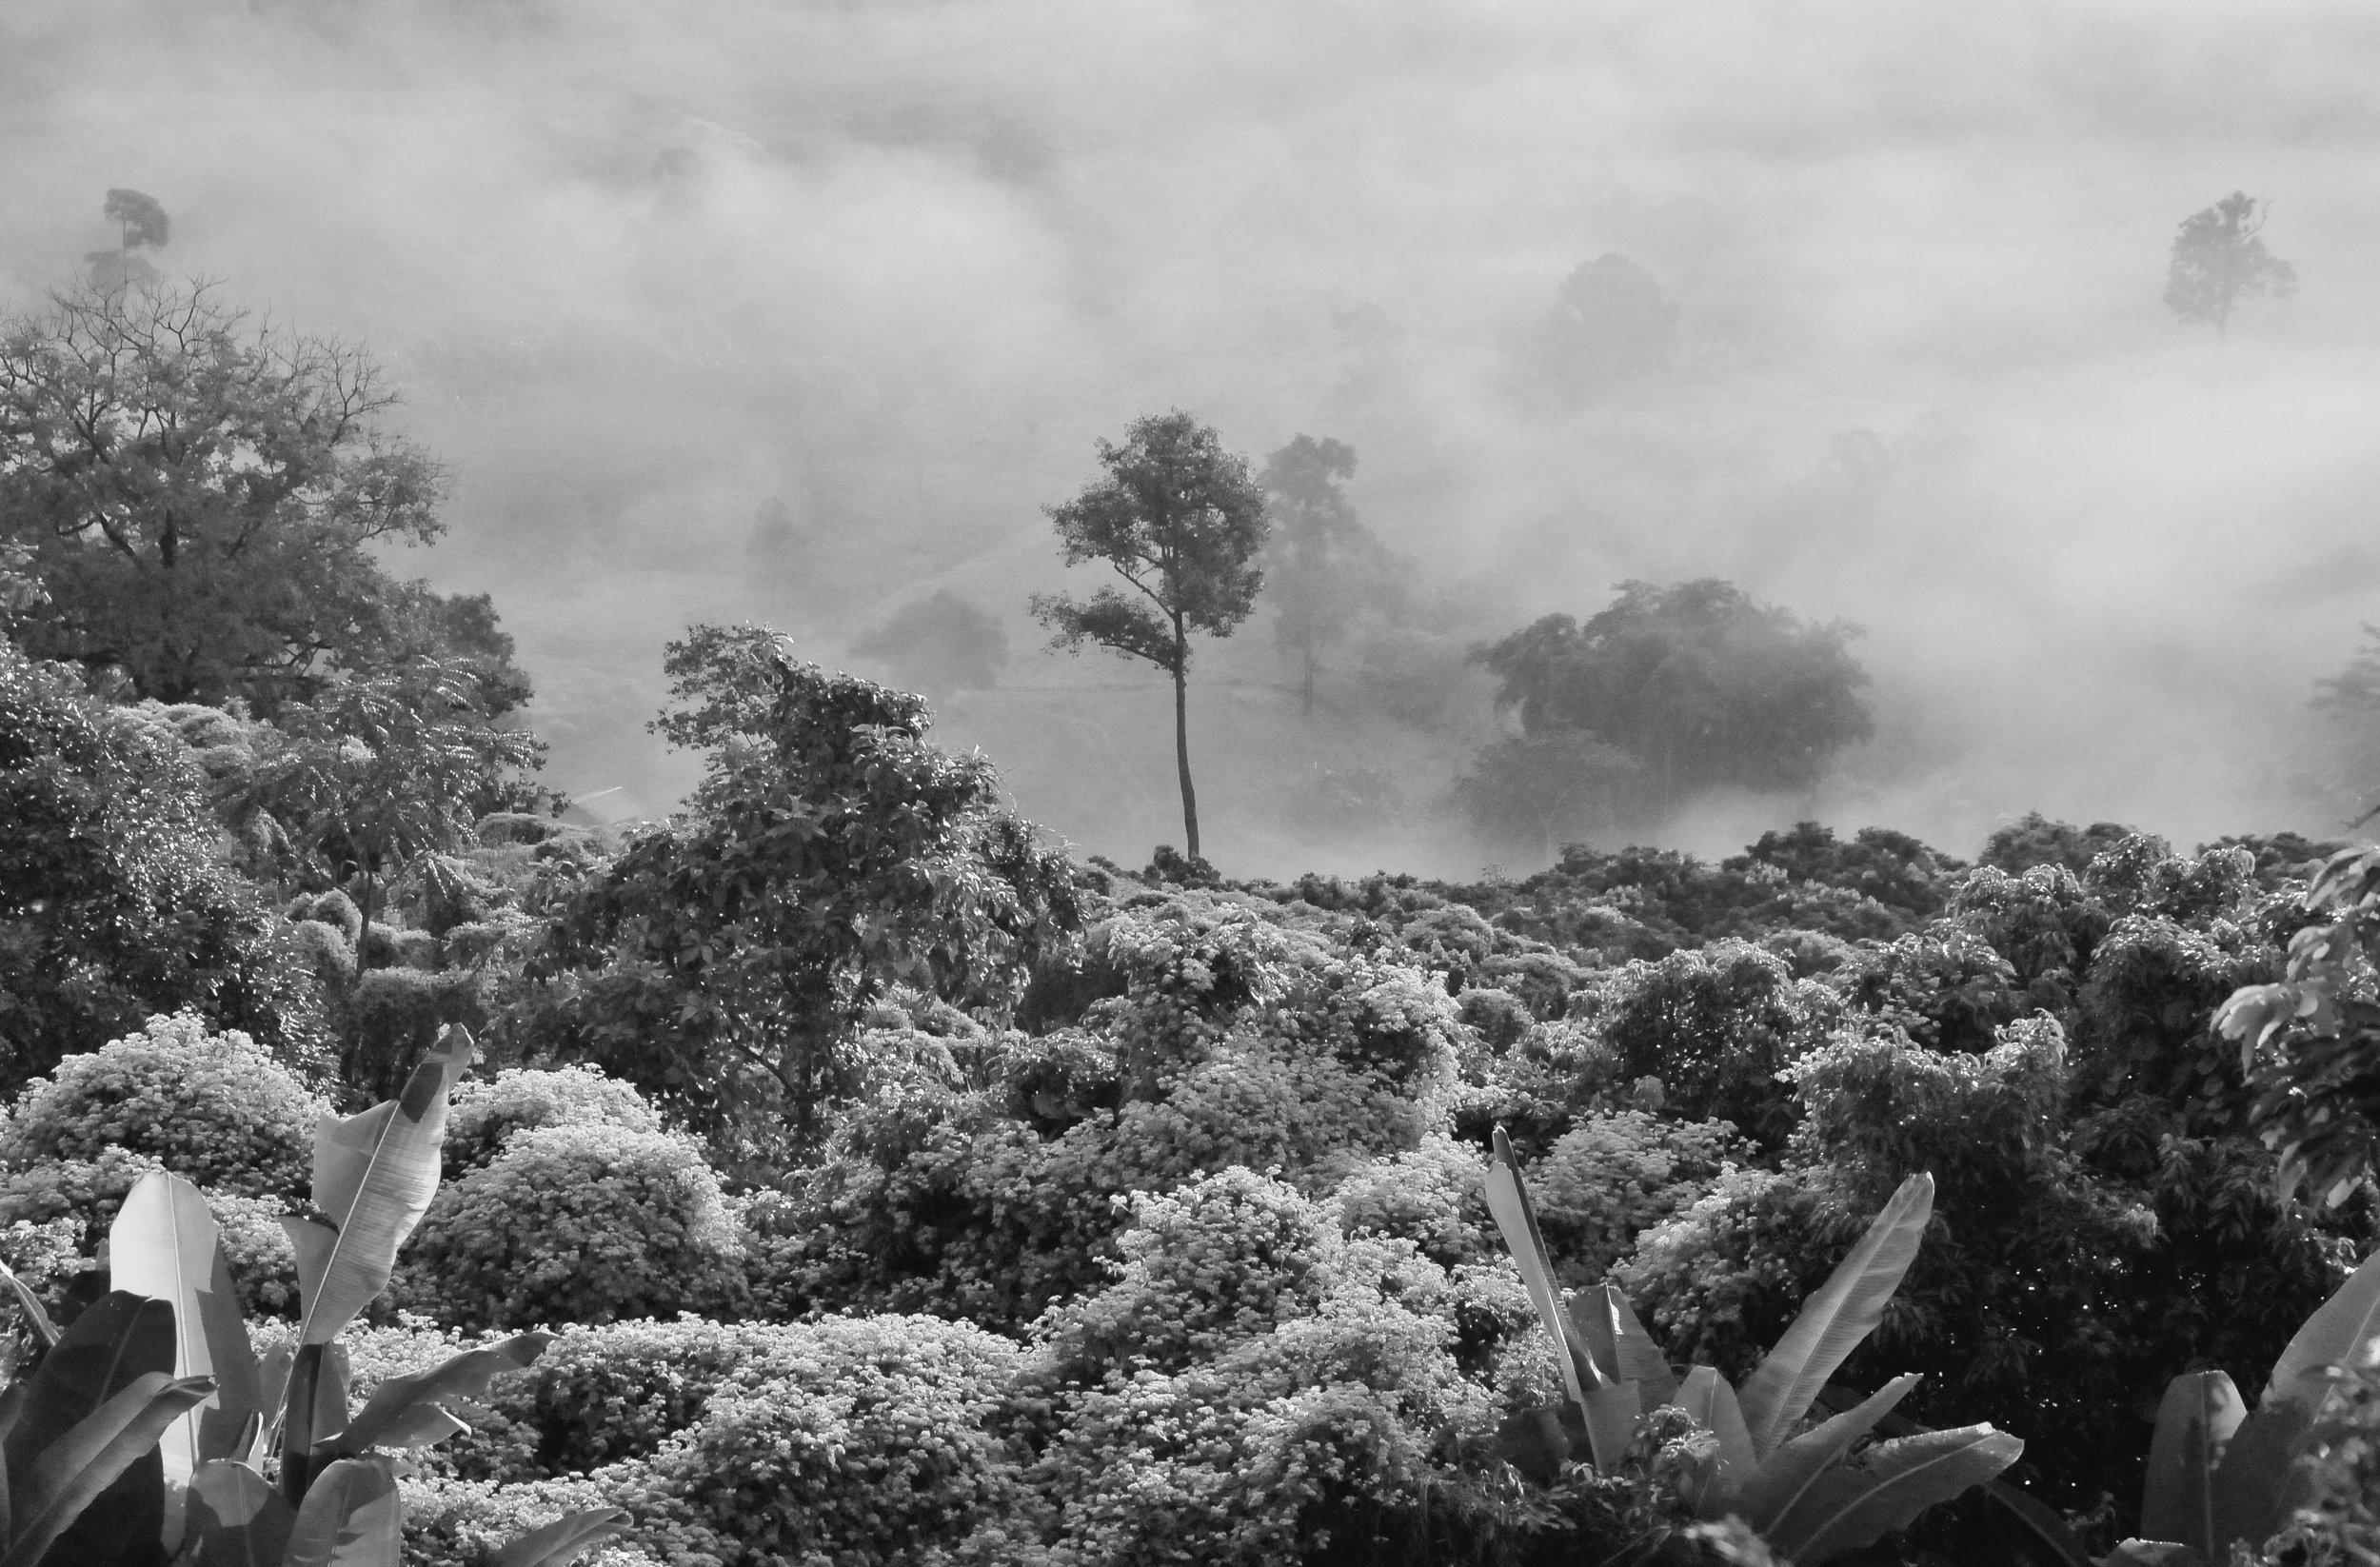 A rainforest shrouded in mist